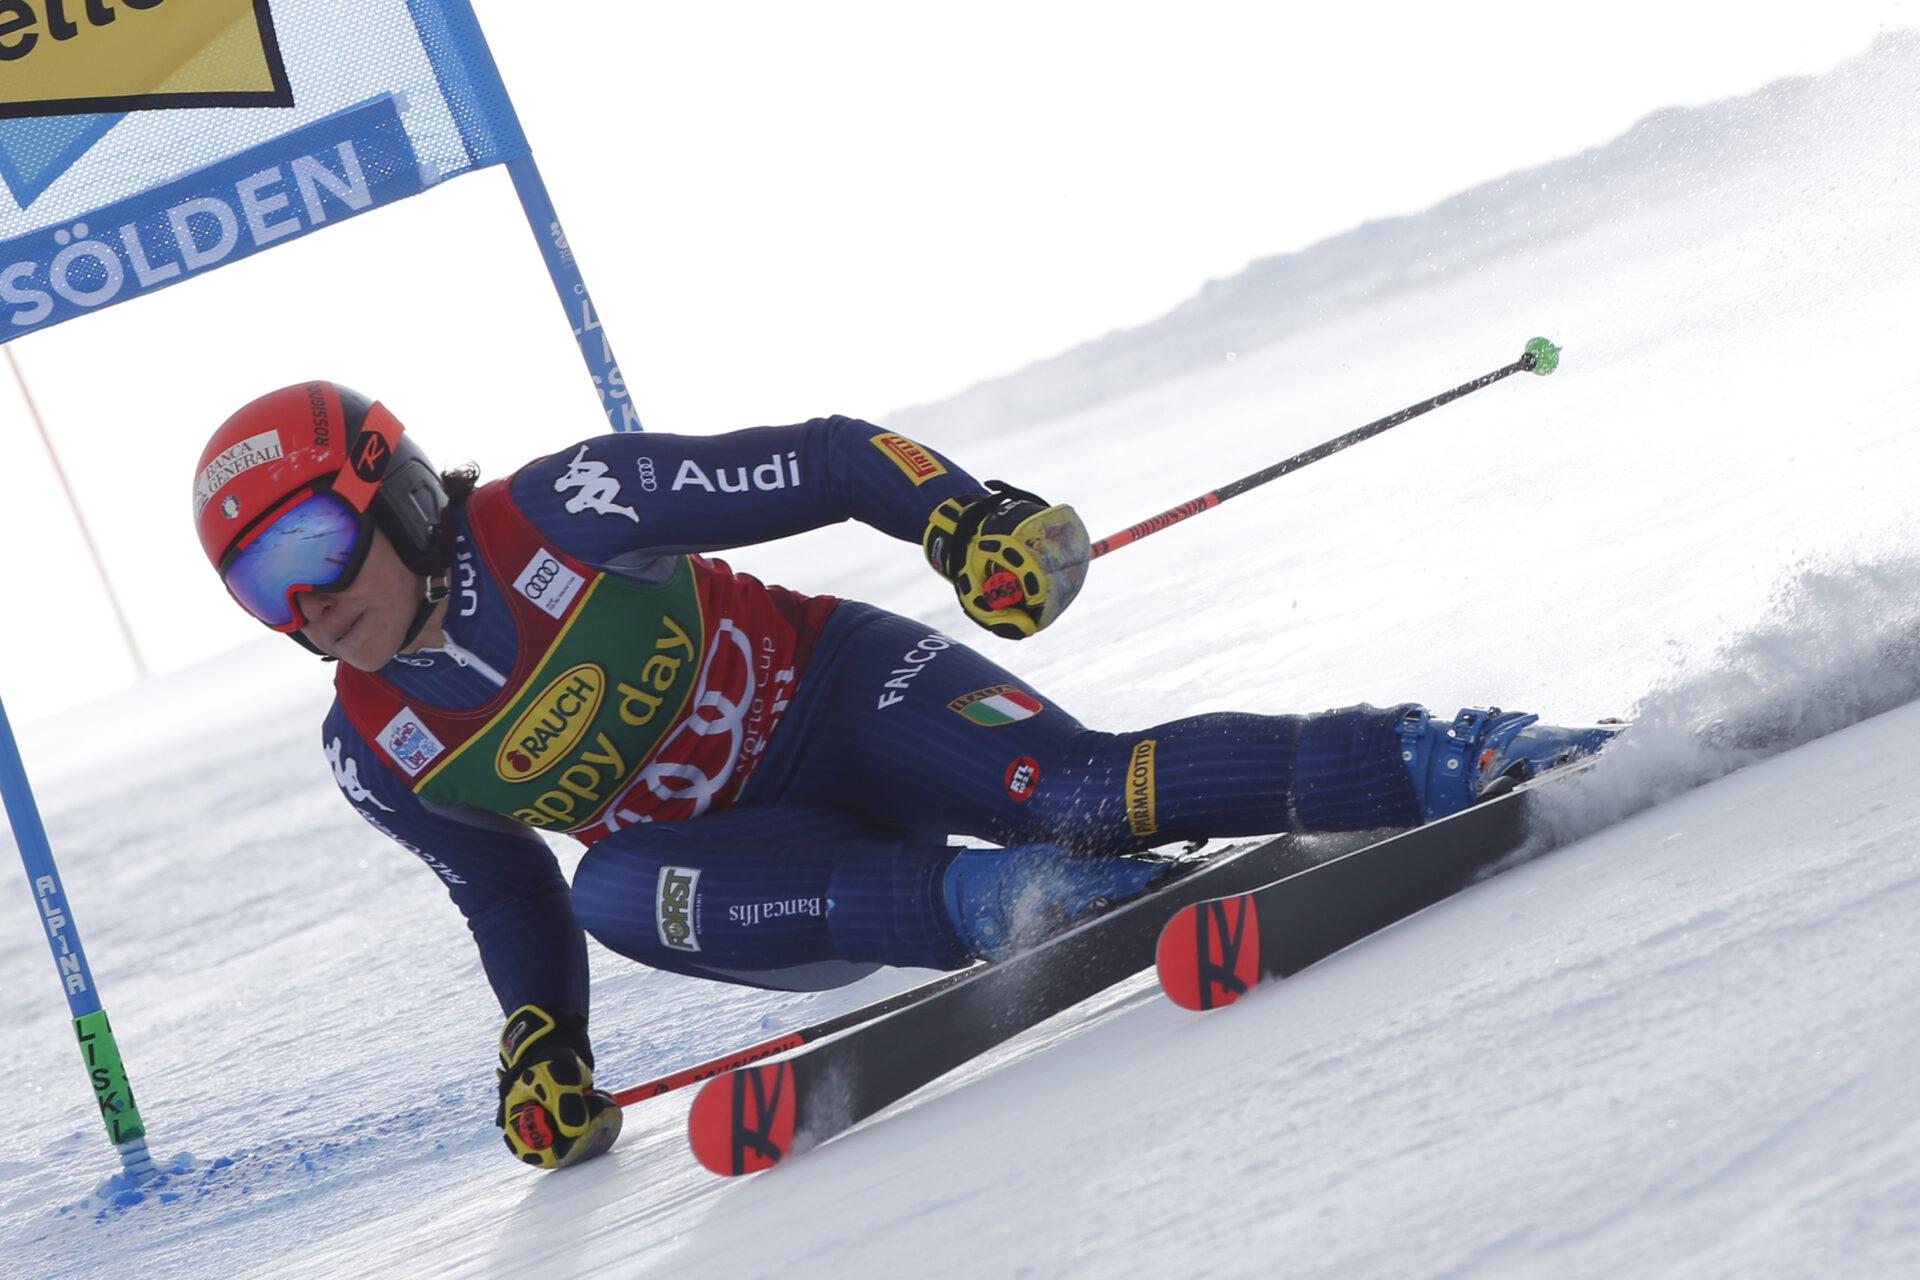 Alpine Ski WorldCup2020/2021. Federica Brignone (ITA) Soelden (AUT) 17/10/2020 Photo: Marco Trovati/Pentaphoto